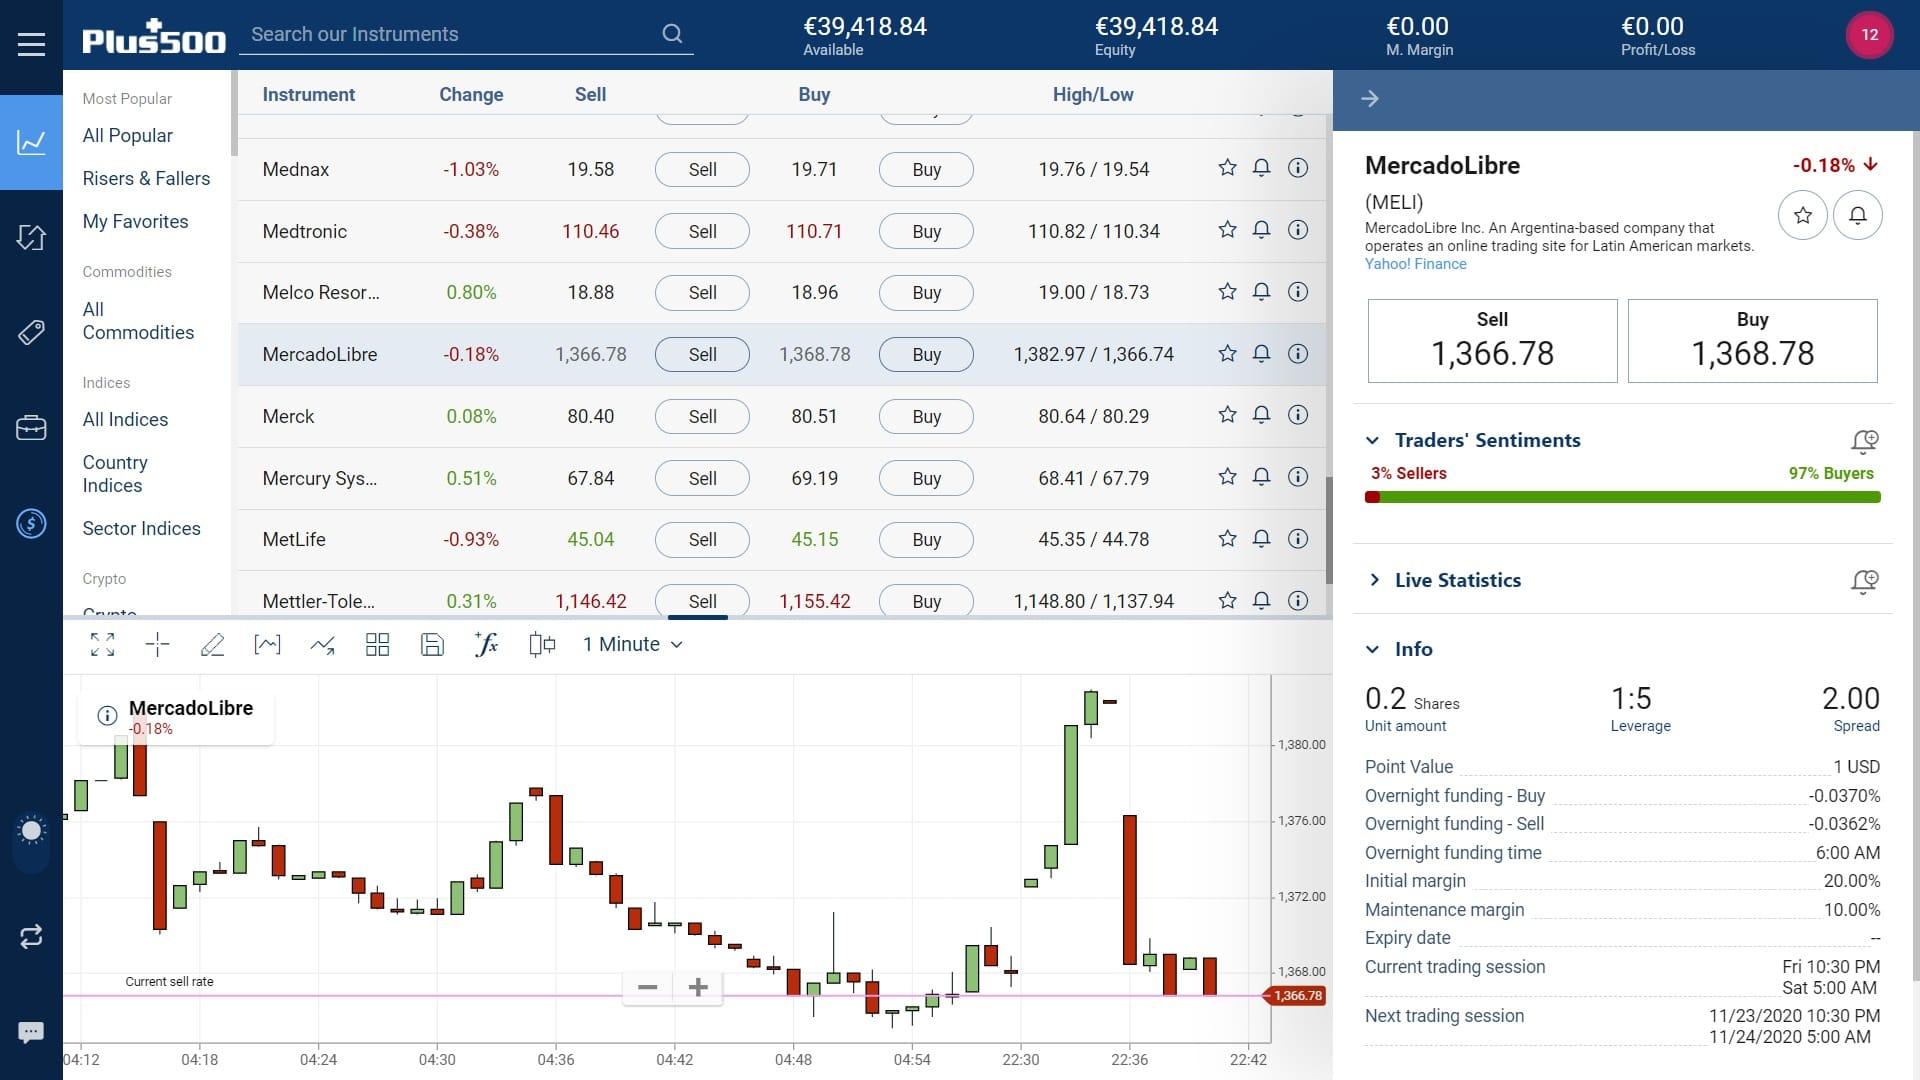 MercadoLibre stock trading on Plus500's WebTrader platform